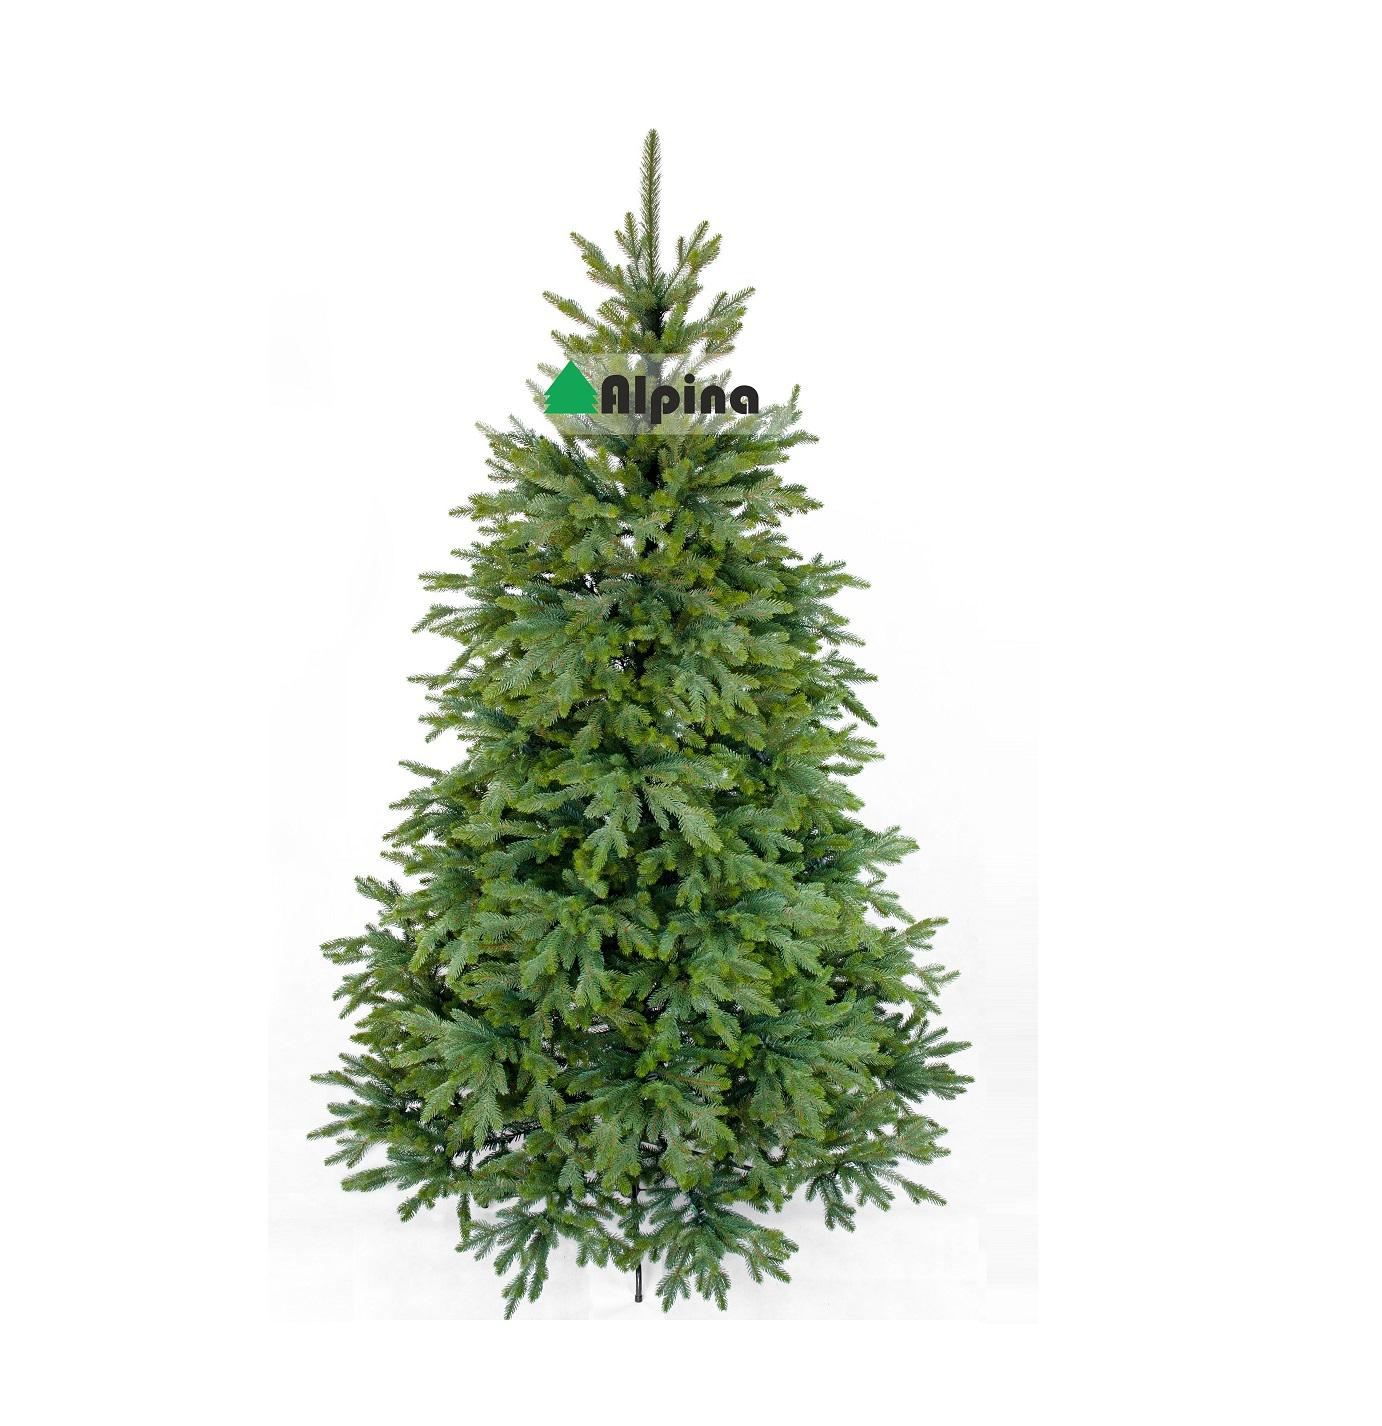 Коледна елха Alpina Смърч 100% PE 180см